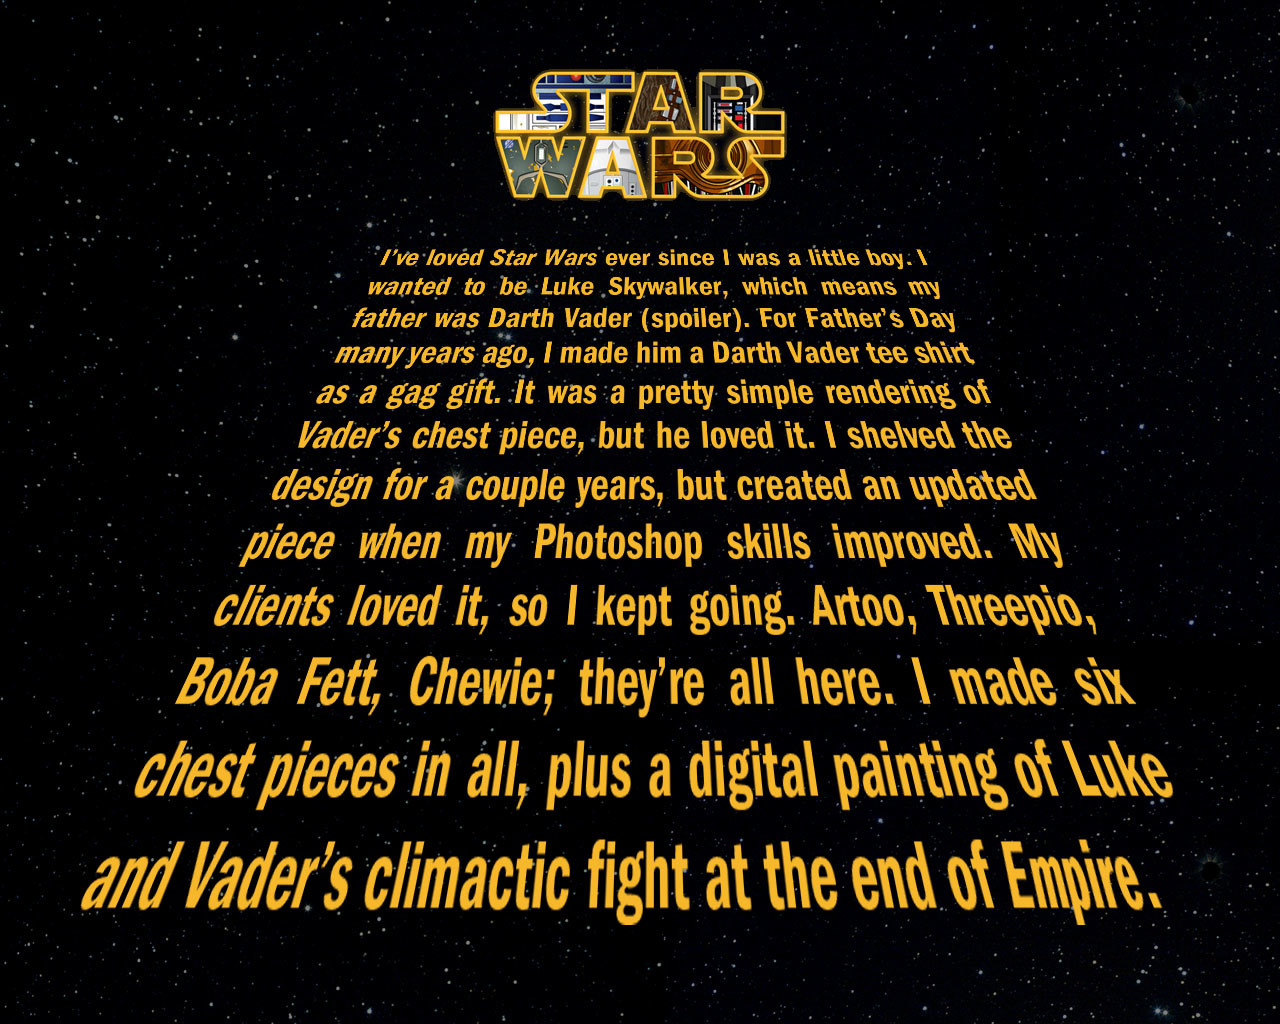 Steve rampton starwars about